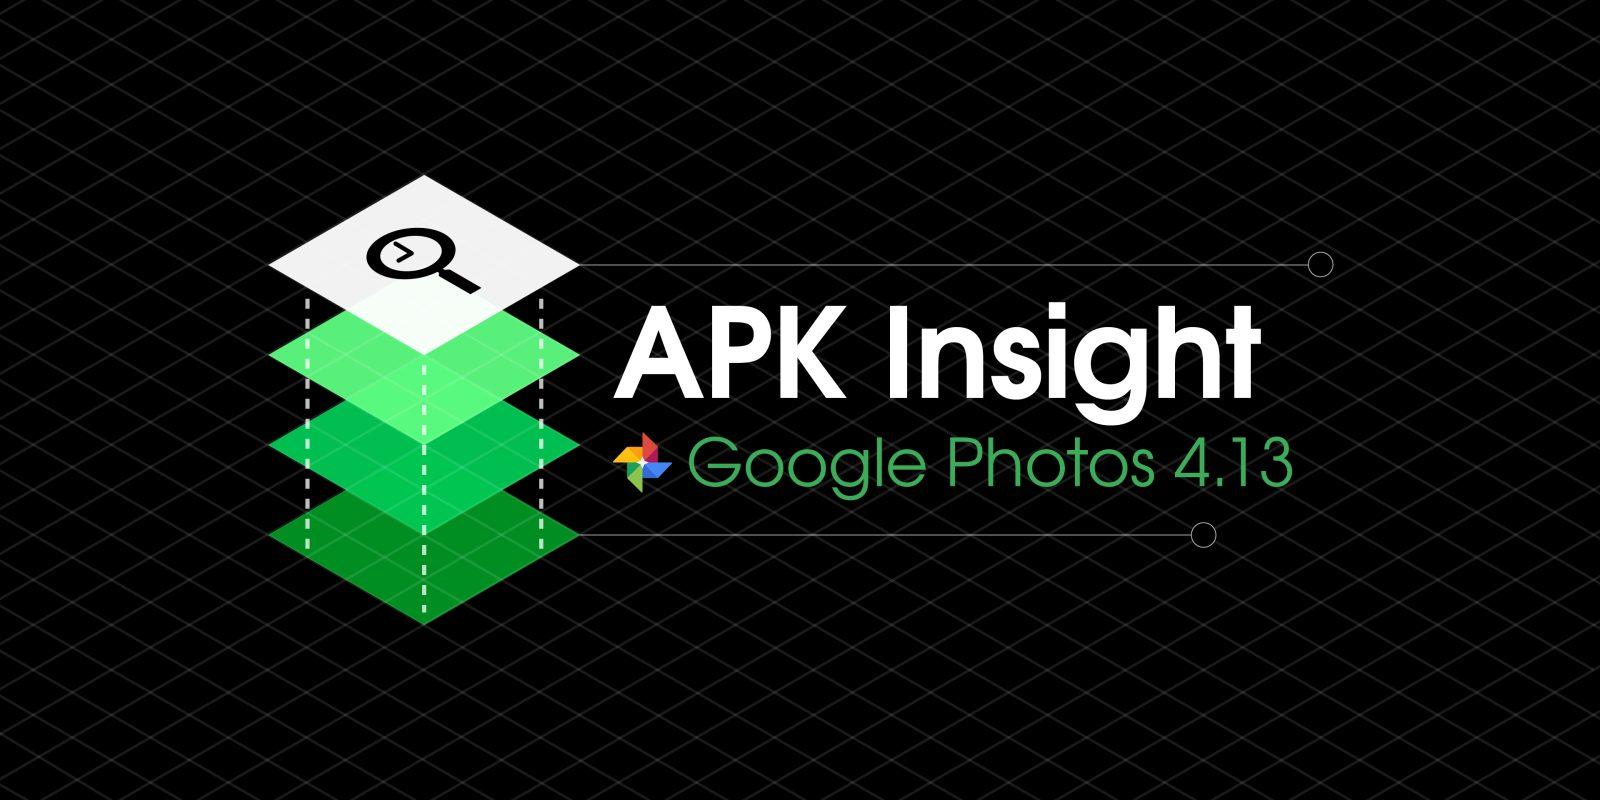 QnA VBage Google Photos 4.13 preps more file size sharing options, tests new 'Create' menu [APK Insight]